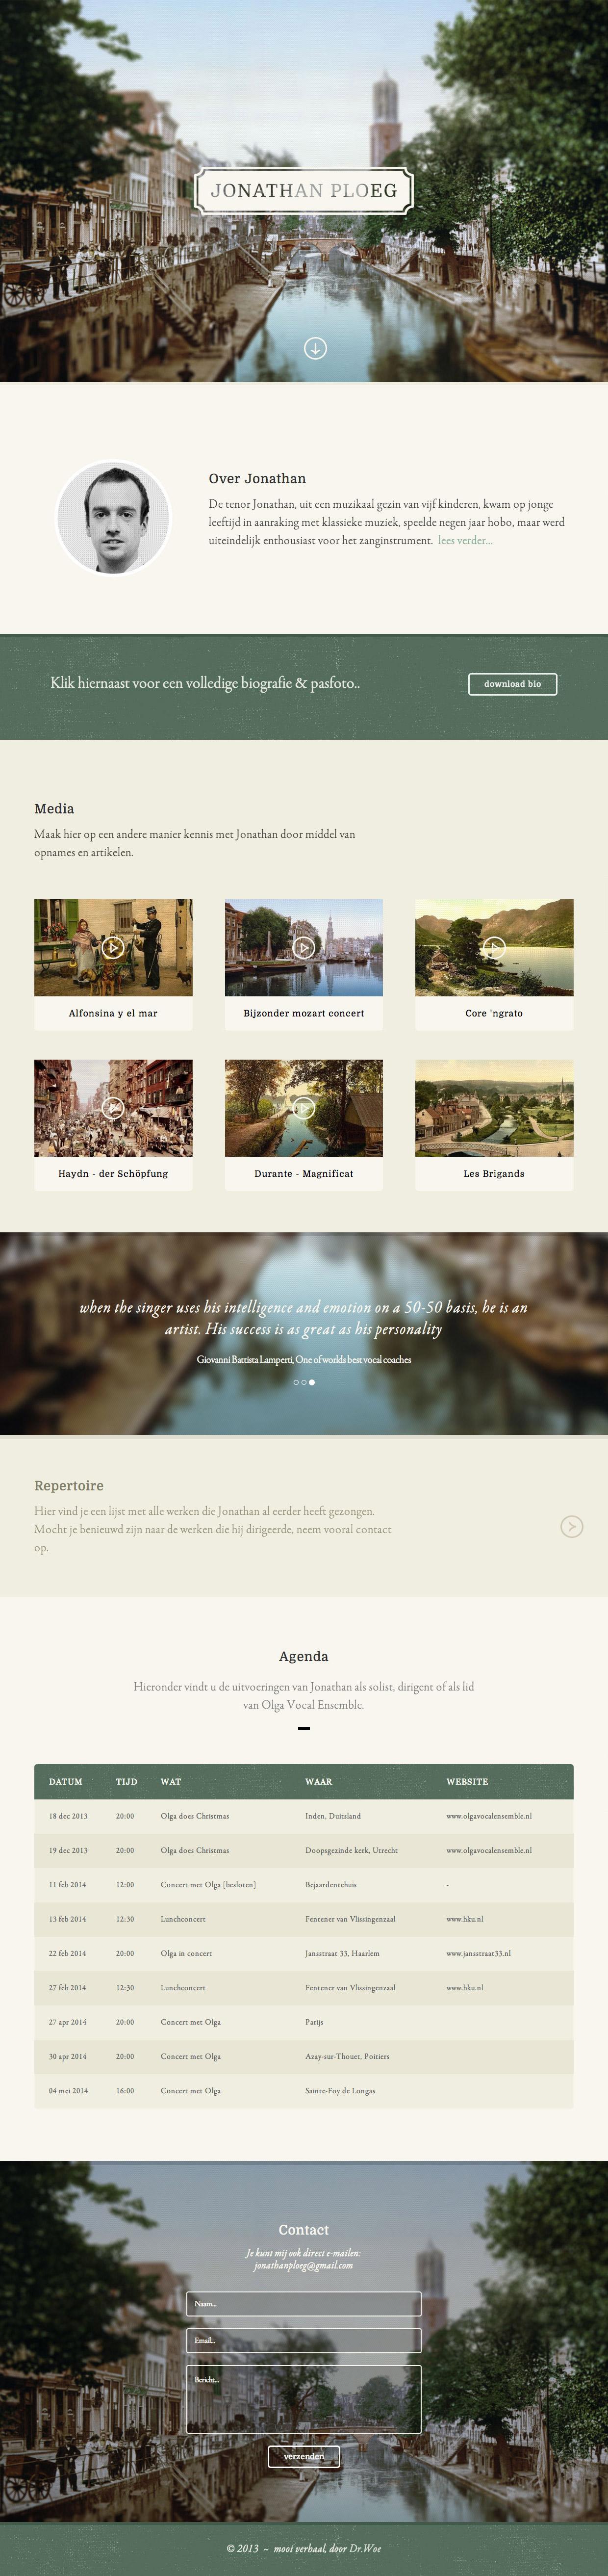 Jonathan Ploeg Website Screenshot